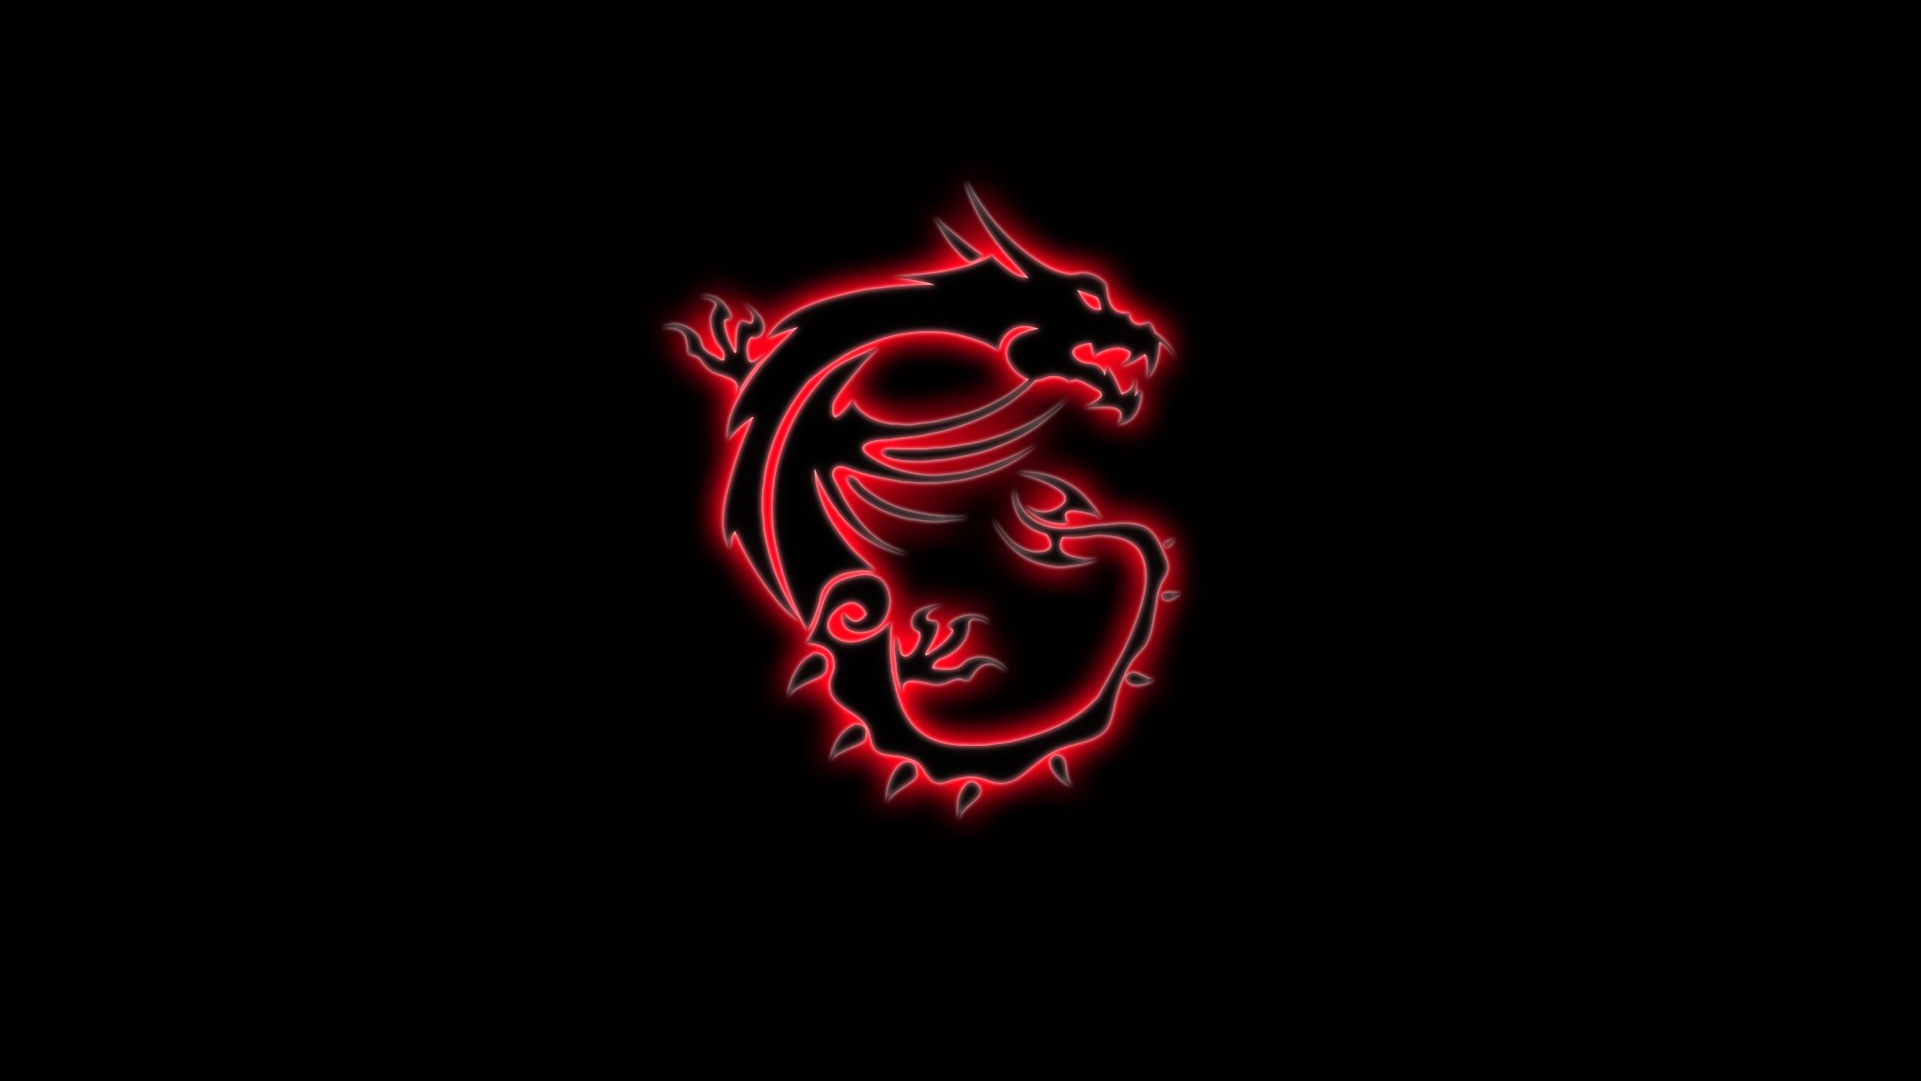 gaming, dragon, red, game, red dragon wallpapers hi .